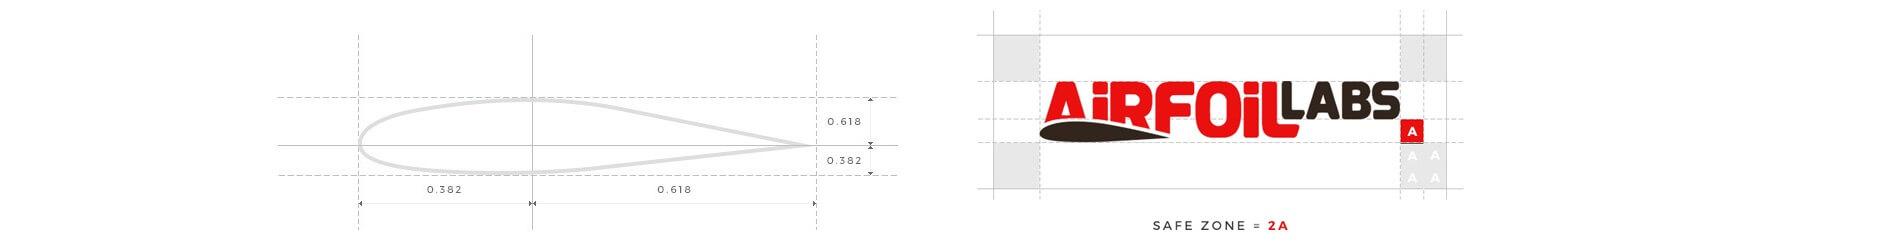 Airfoillabs C172SP 00 bendix mn 20e wiring diagram diagram wiring diagrams for diy car  at readyjetset.co